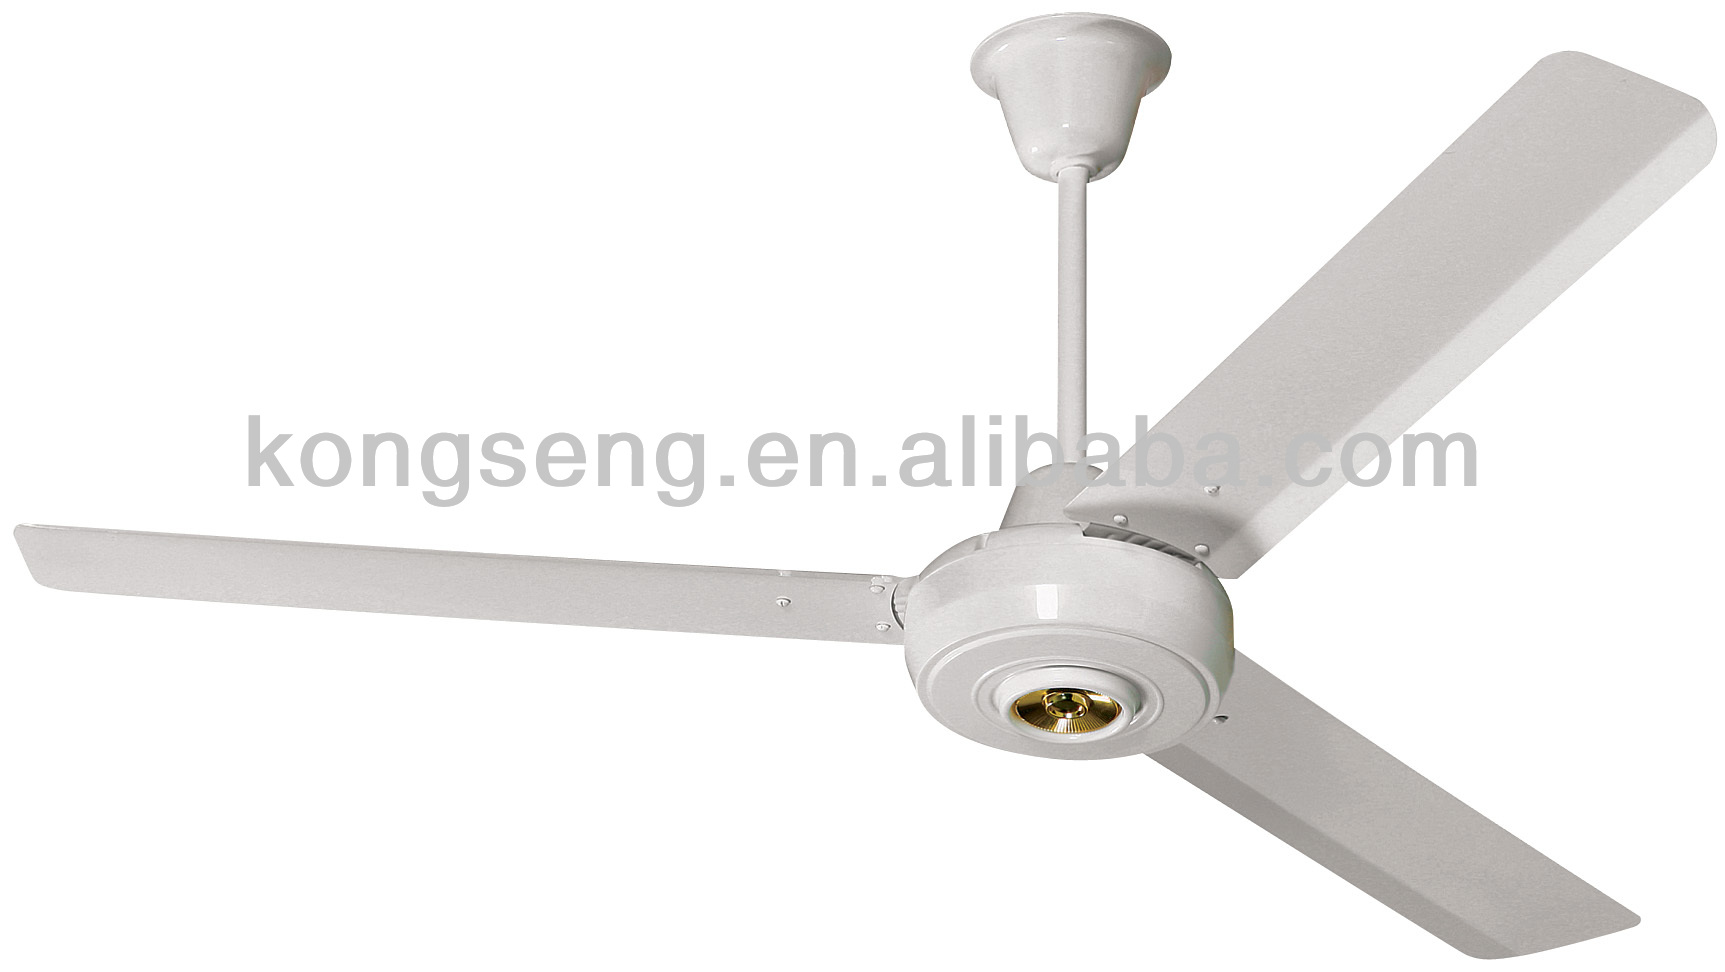 plastic cover kdk ceiling fan buy kdk ceiling fan kdk model plastic cover ceiling fan product. Black Bedroom Furniture Sets. Home Design Ideas